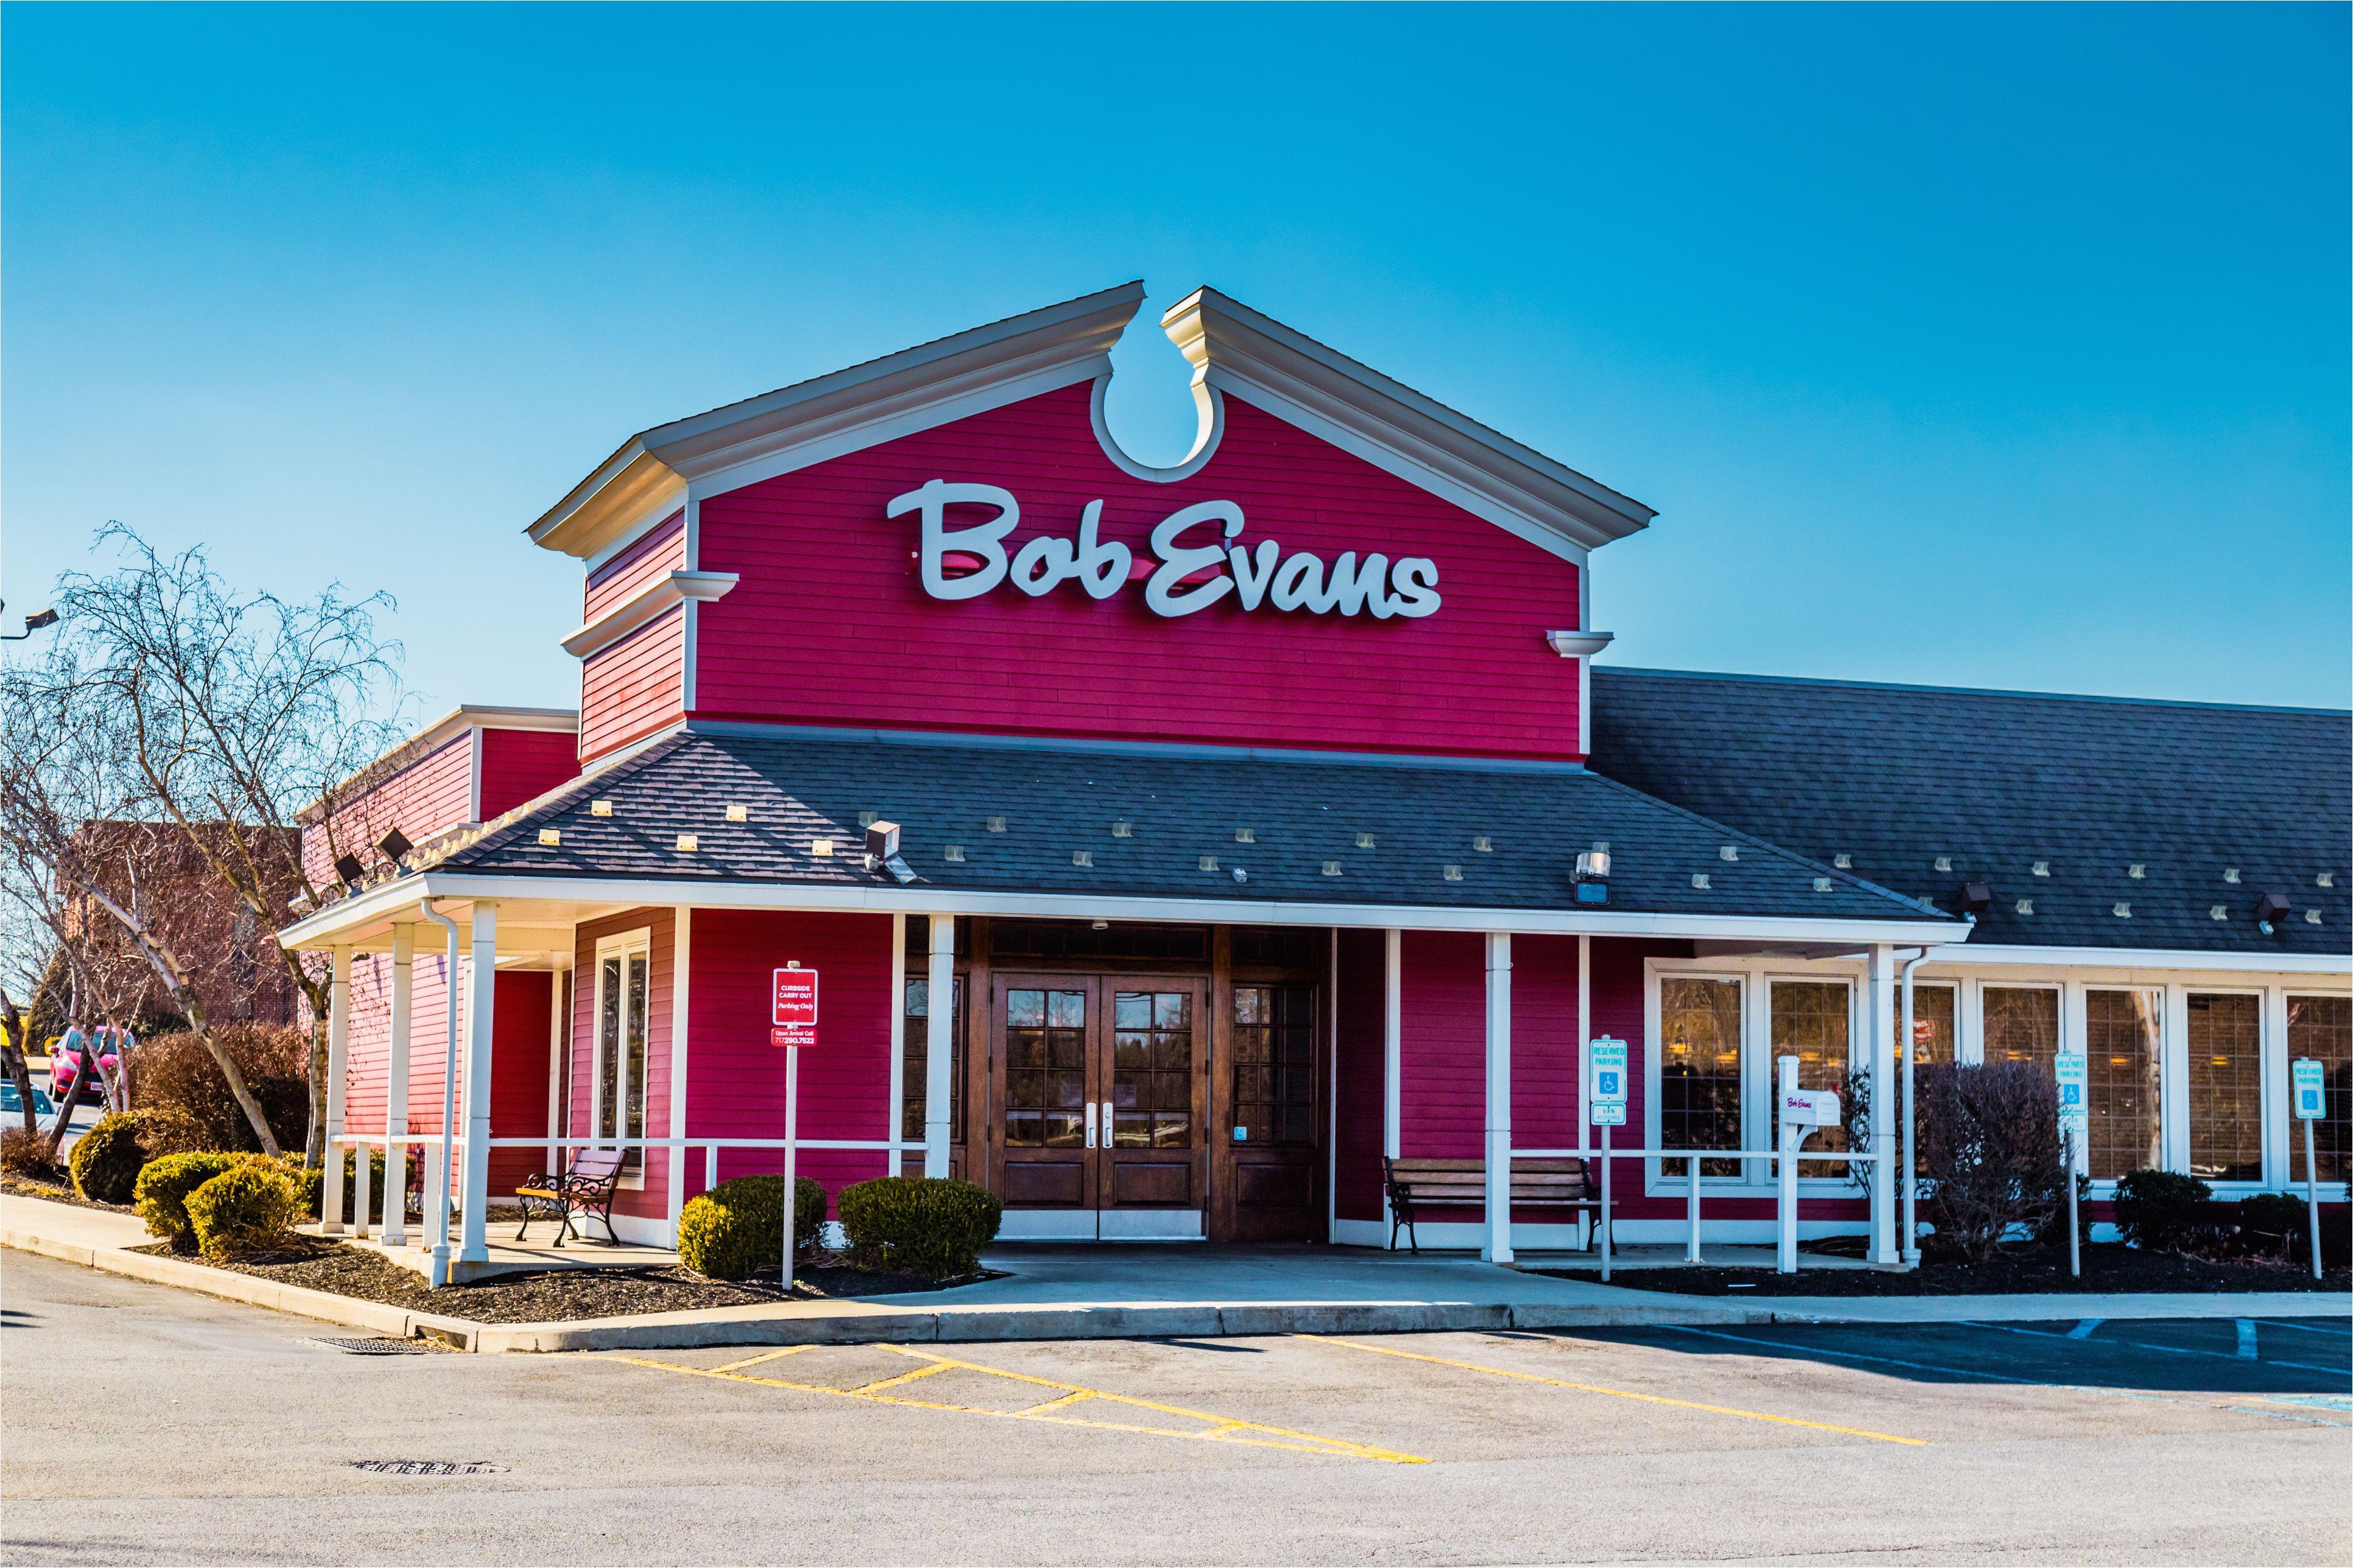 bob evans restaurant entrance 894165918 5bd49b6046e0fb0051f63133 jpg